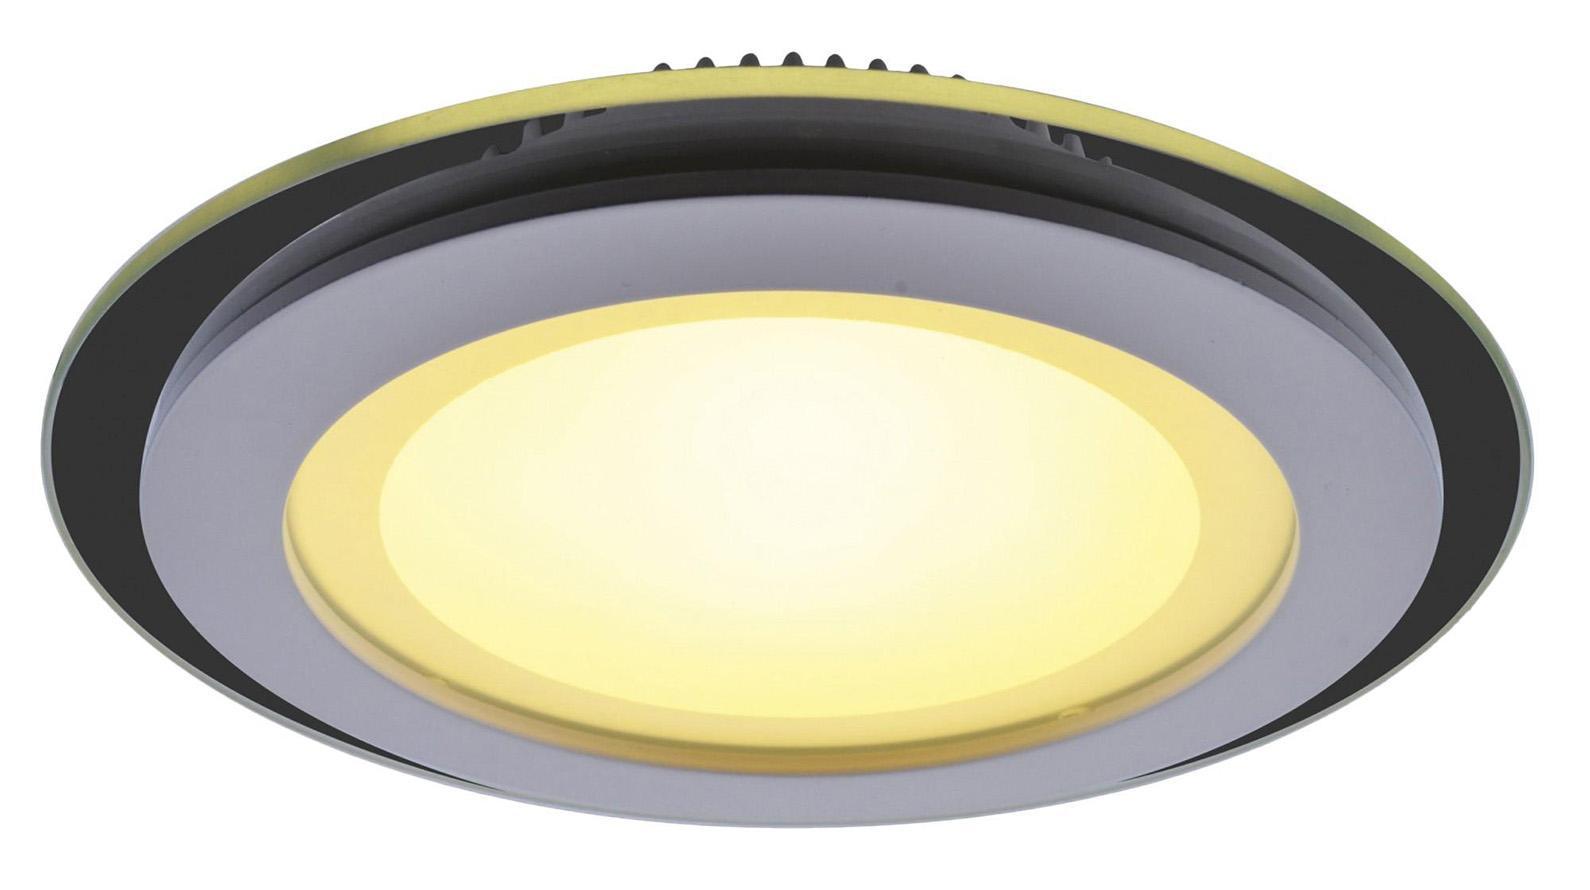 A4112PL-1WH RAGGIO Встраиваемый светильникA4112PL-1WH12W LED; 960 lm